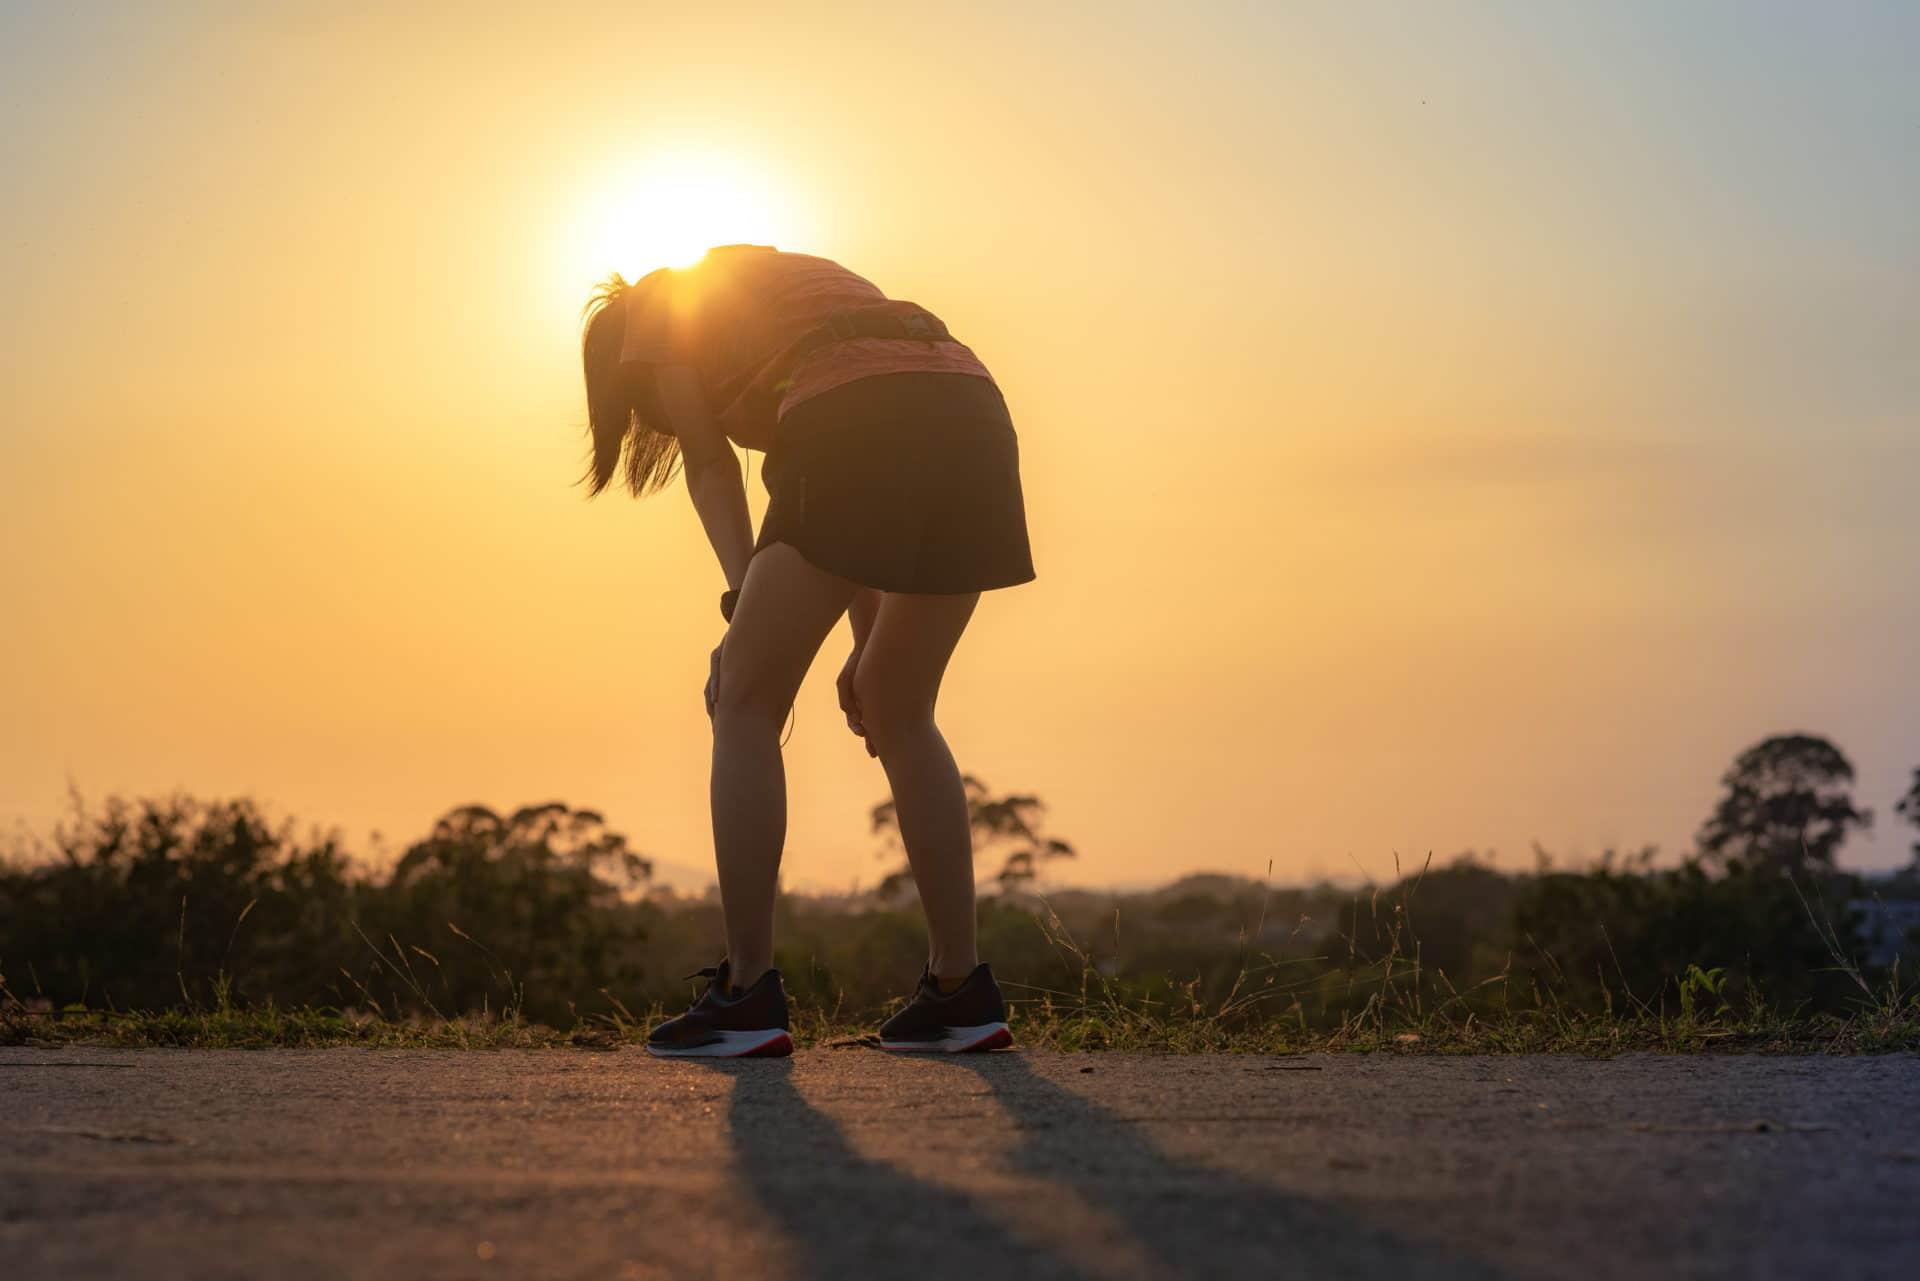 Jogging Entkräftet Coaching Personaltraining, Fitness, Coaching und Personaltrainer Berlin, Ernährungscoach